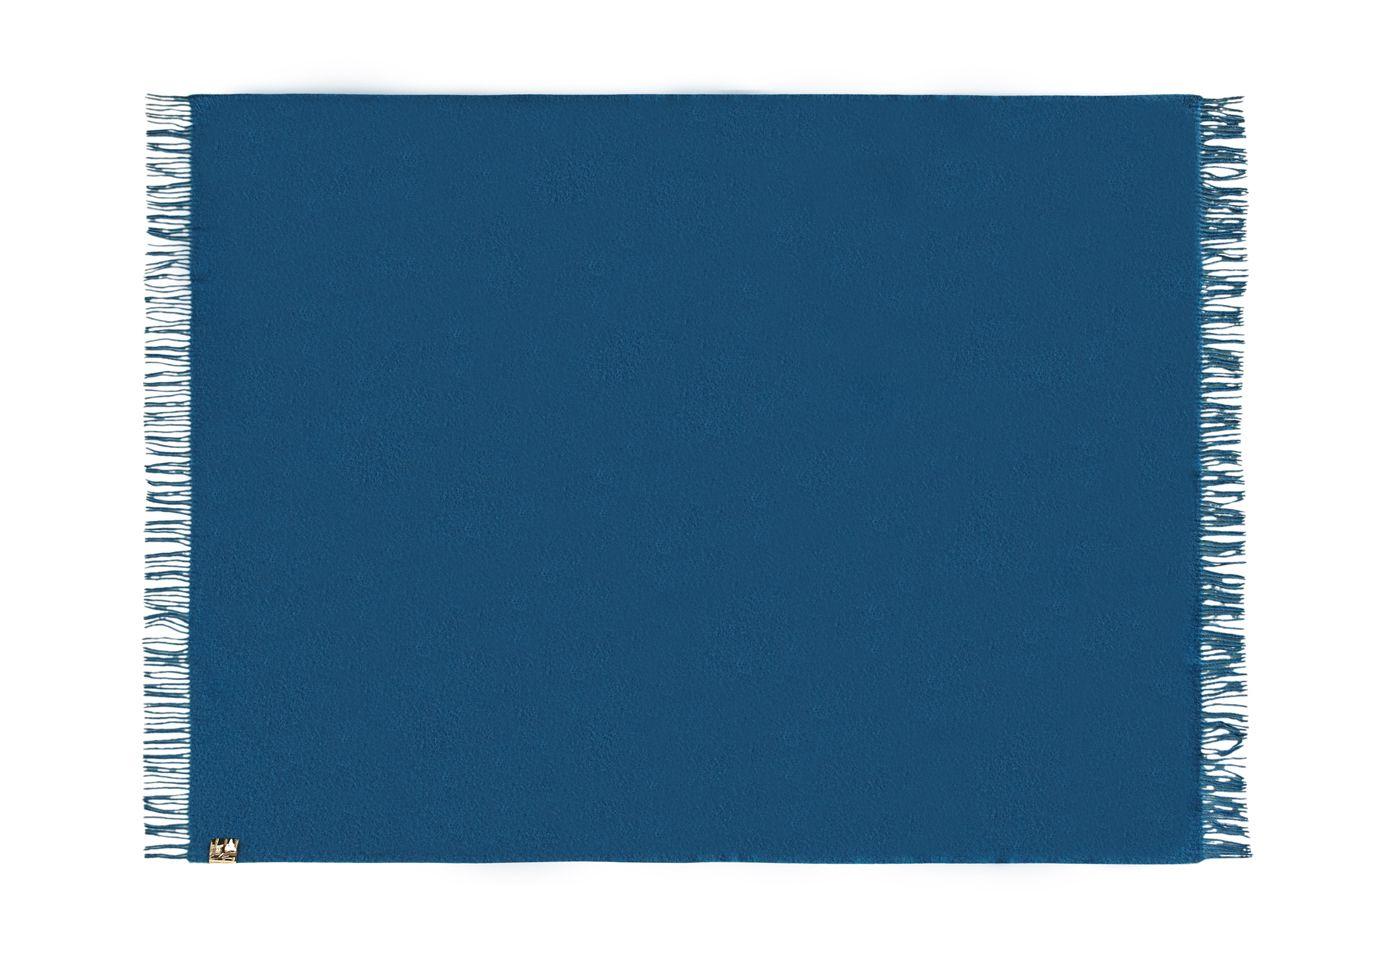 Athen Plaid, Uld, Petrol-Blue, 200x130 - Silkeborg Uldspinderi